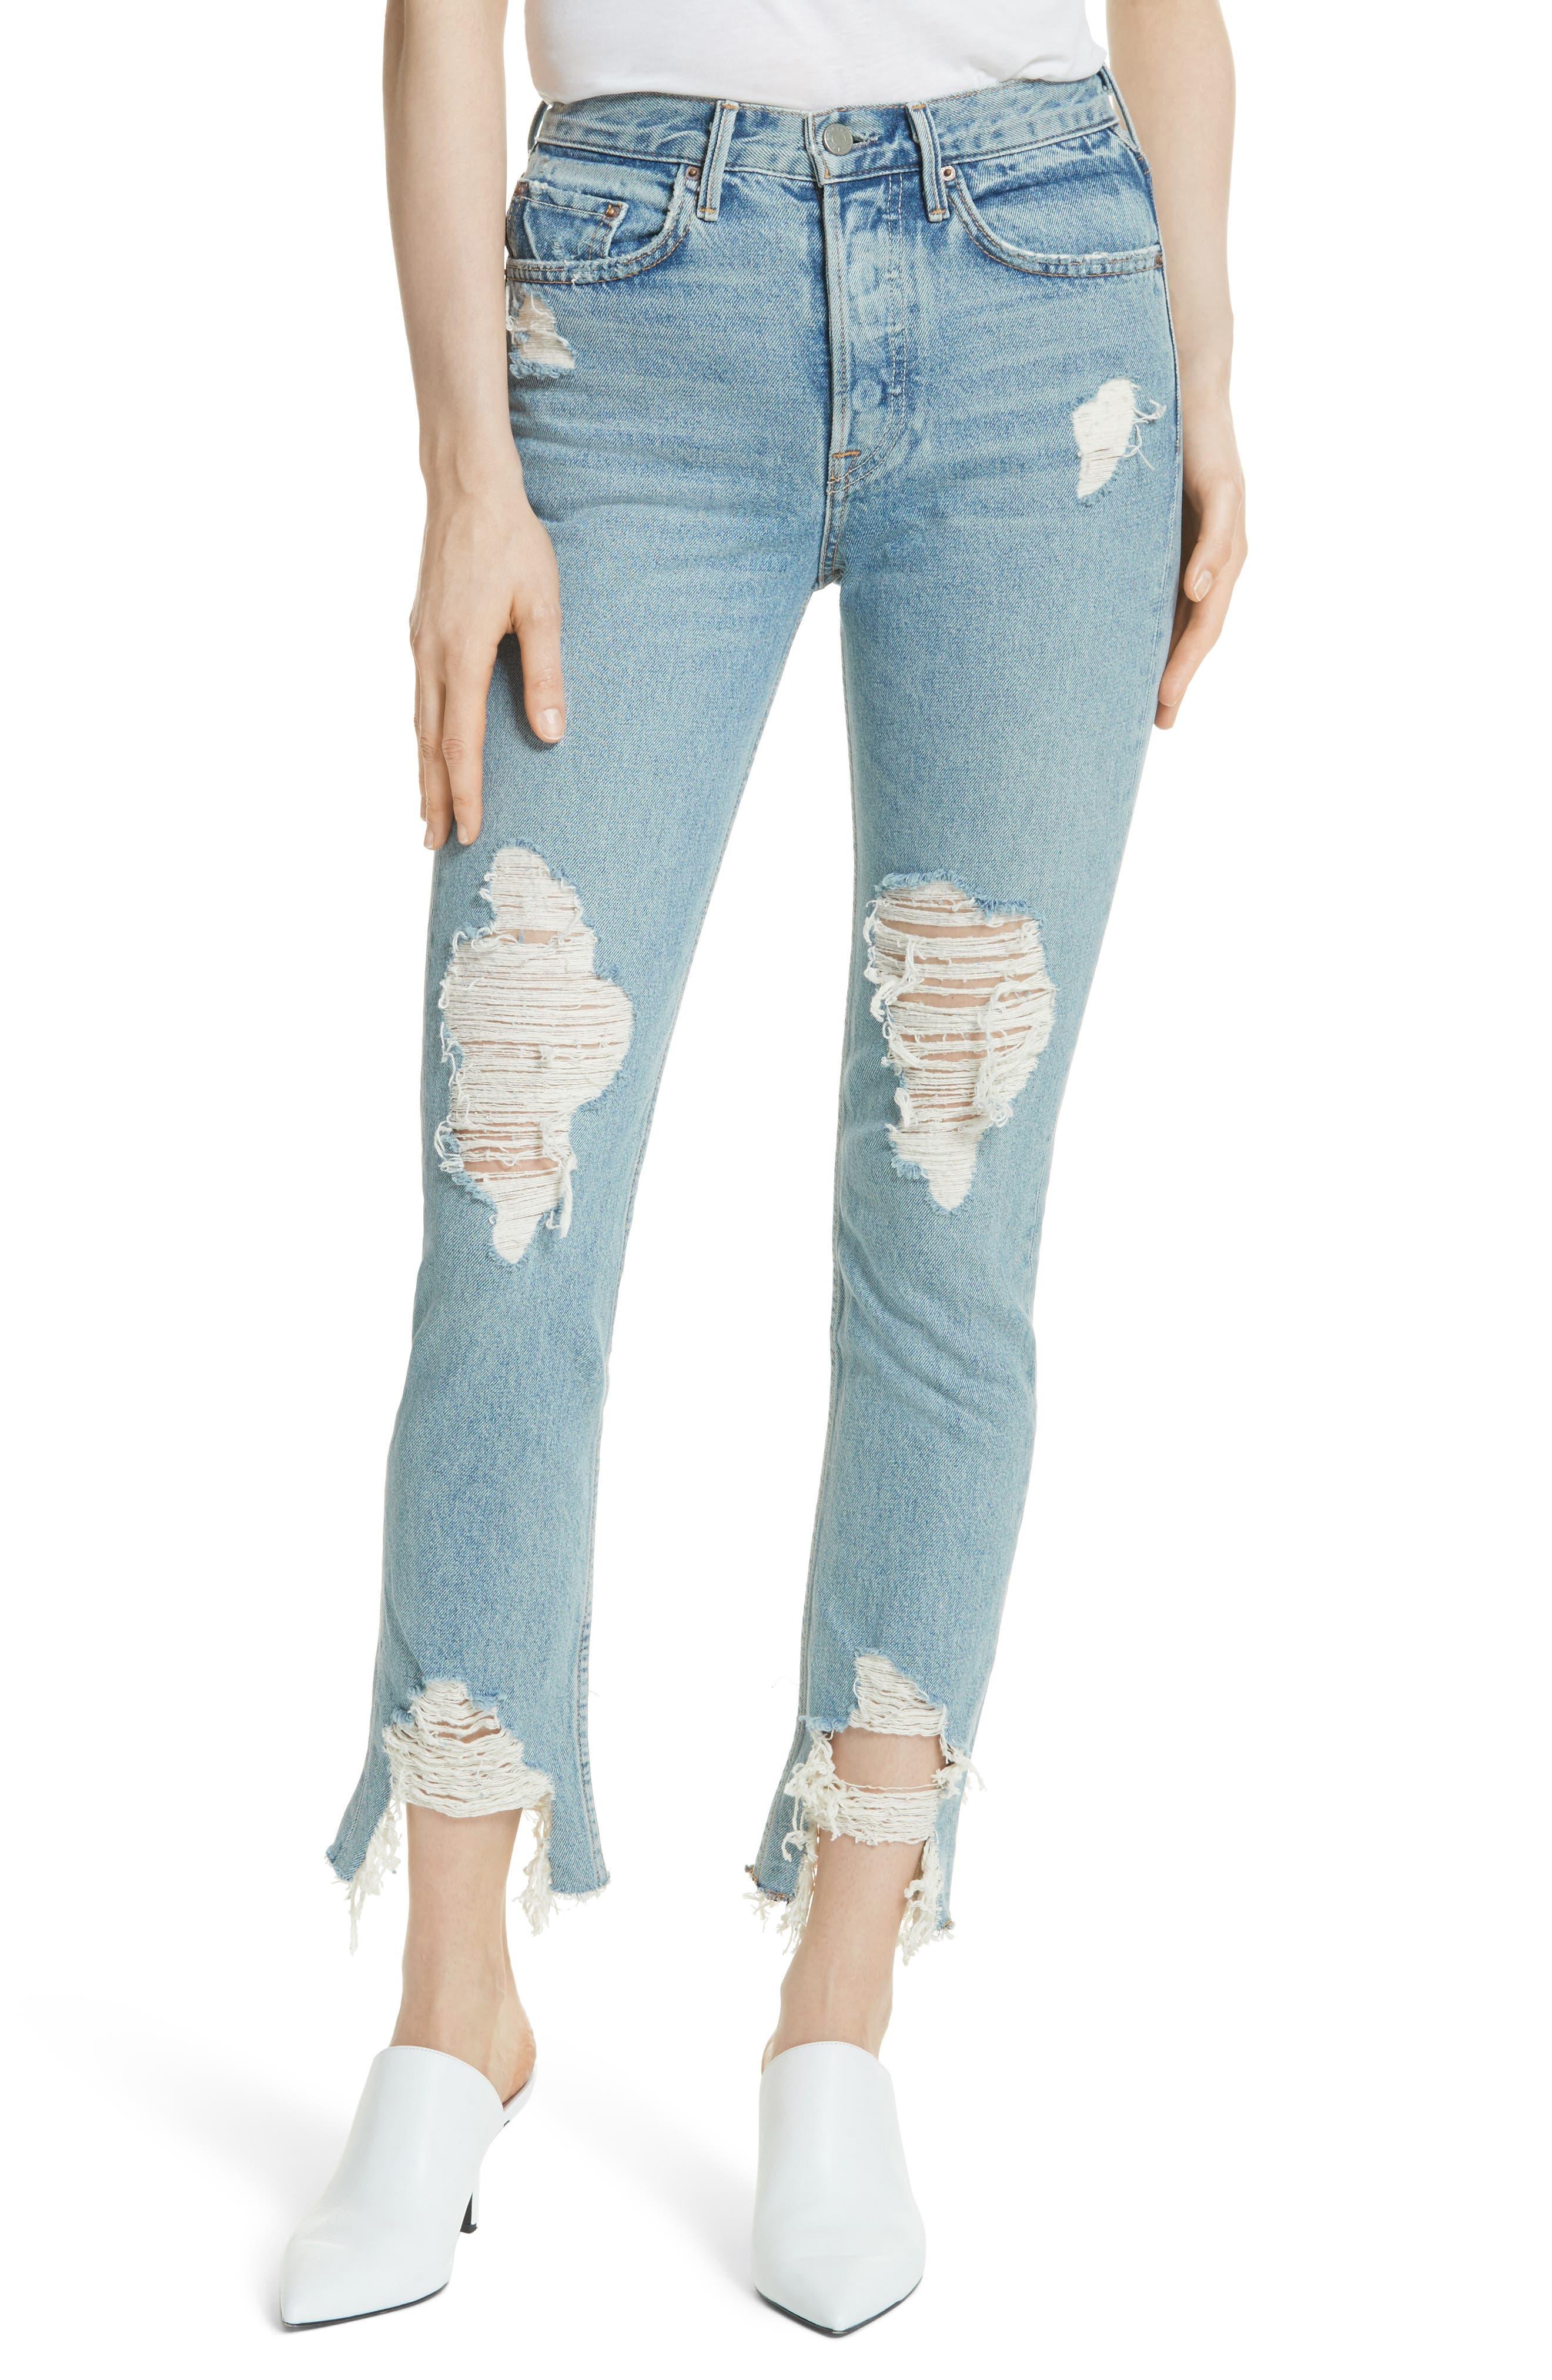 Alternate Image 1 Selected - GRLFRND Karolina High Waist Jeans (Tough Love)